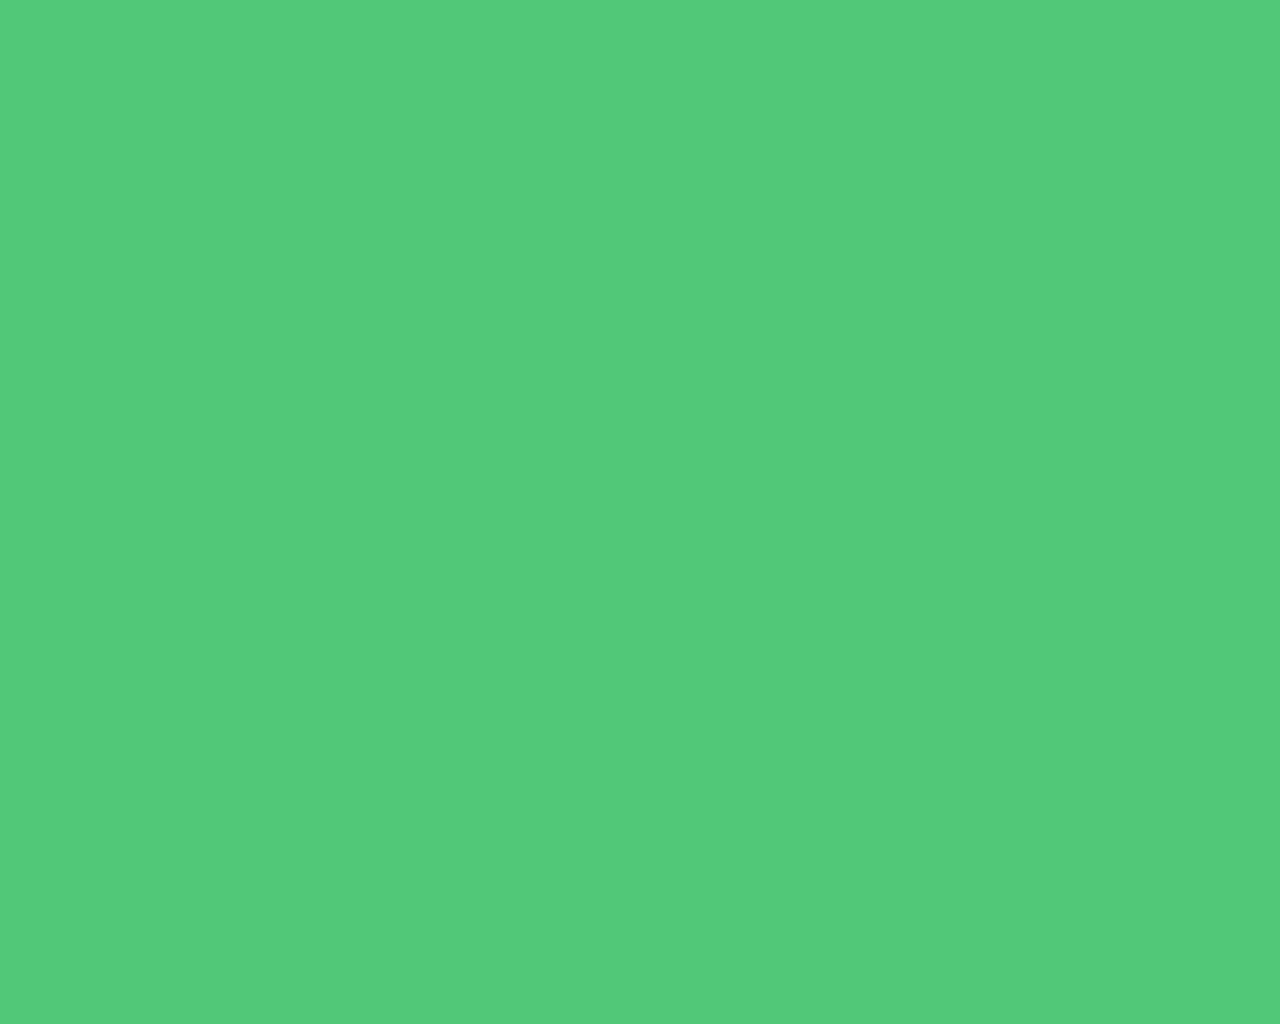 1280x1024 Paris Green Solid Color Background